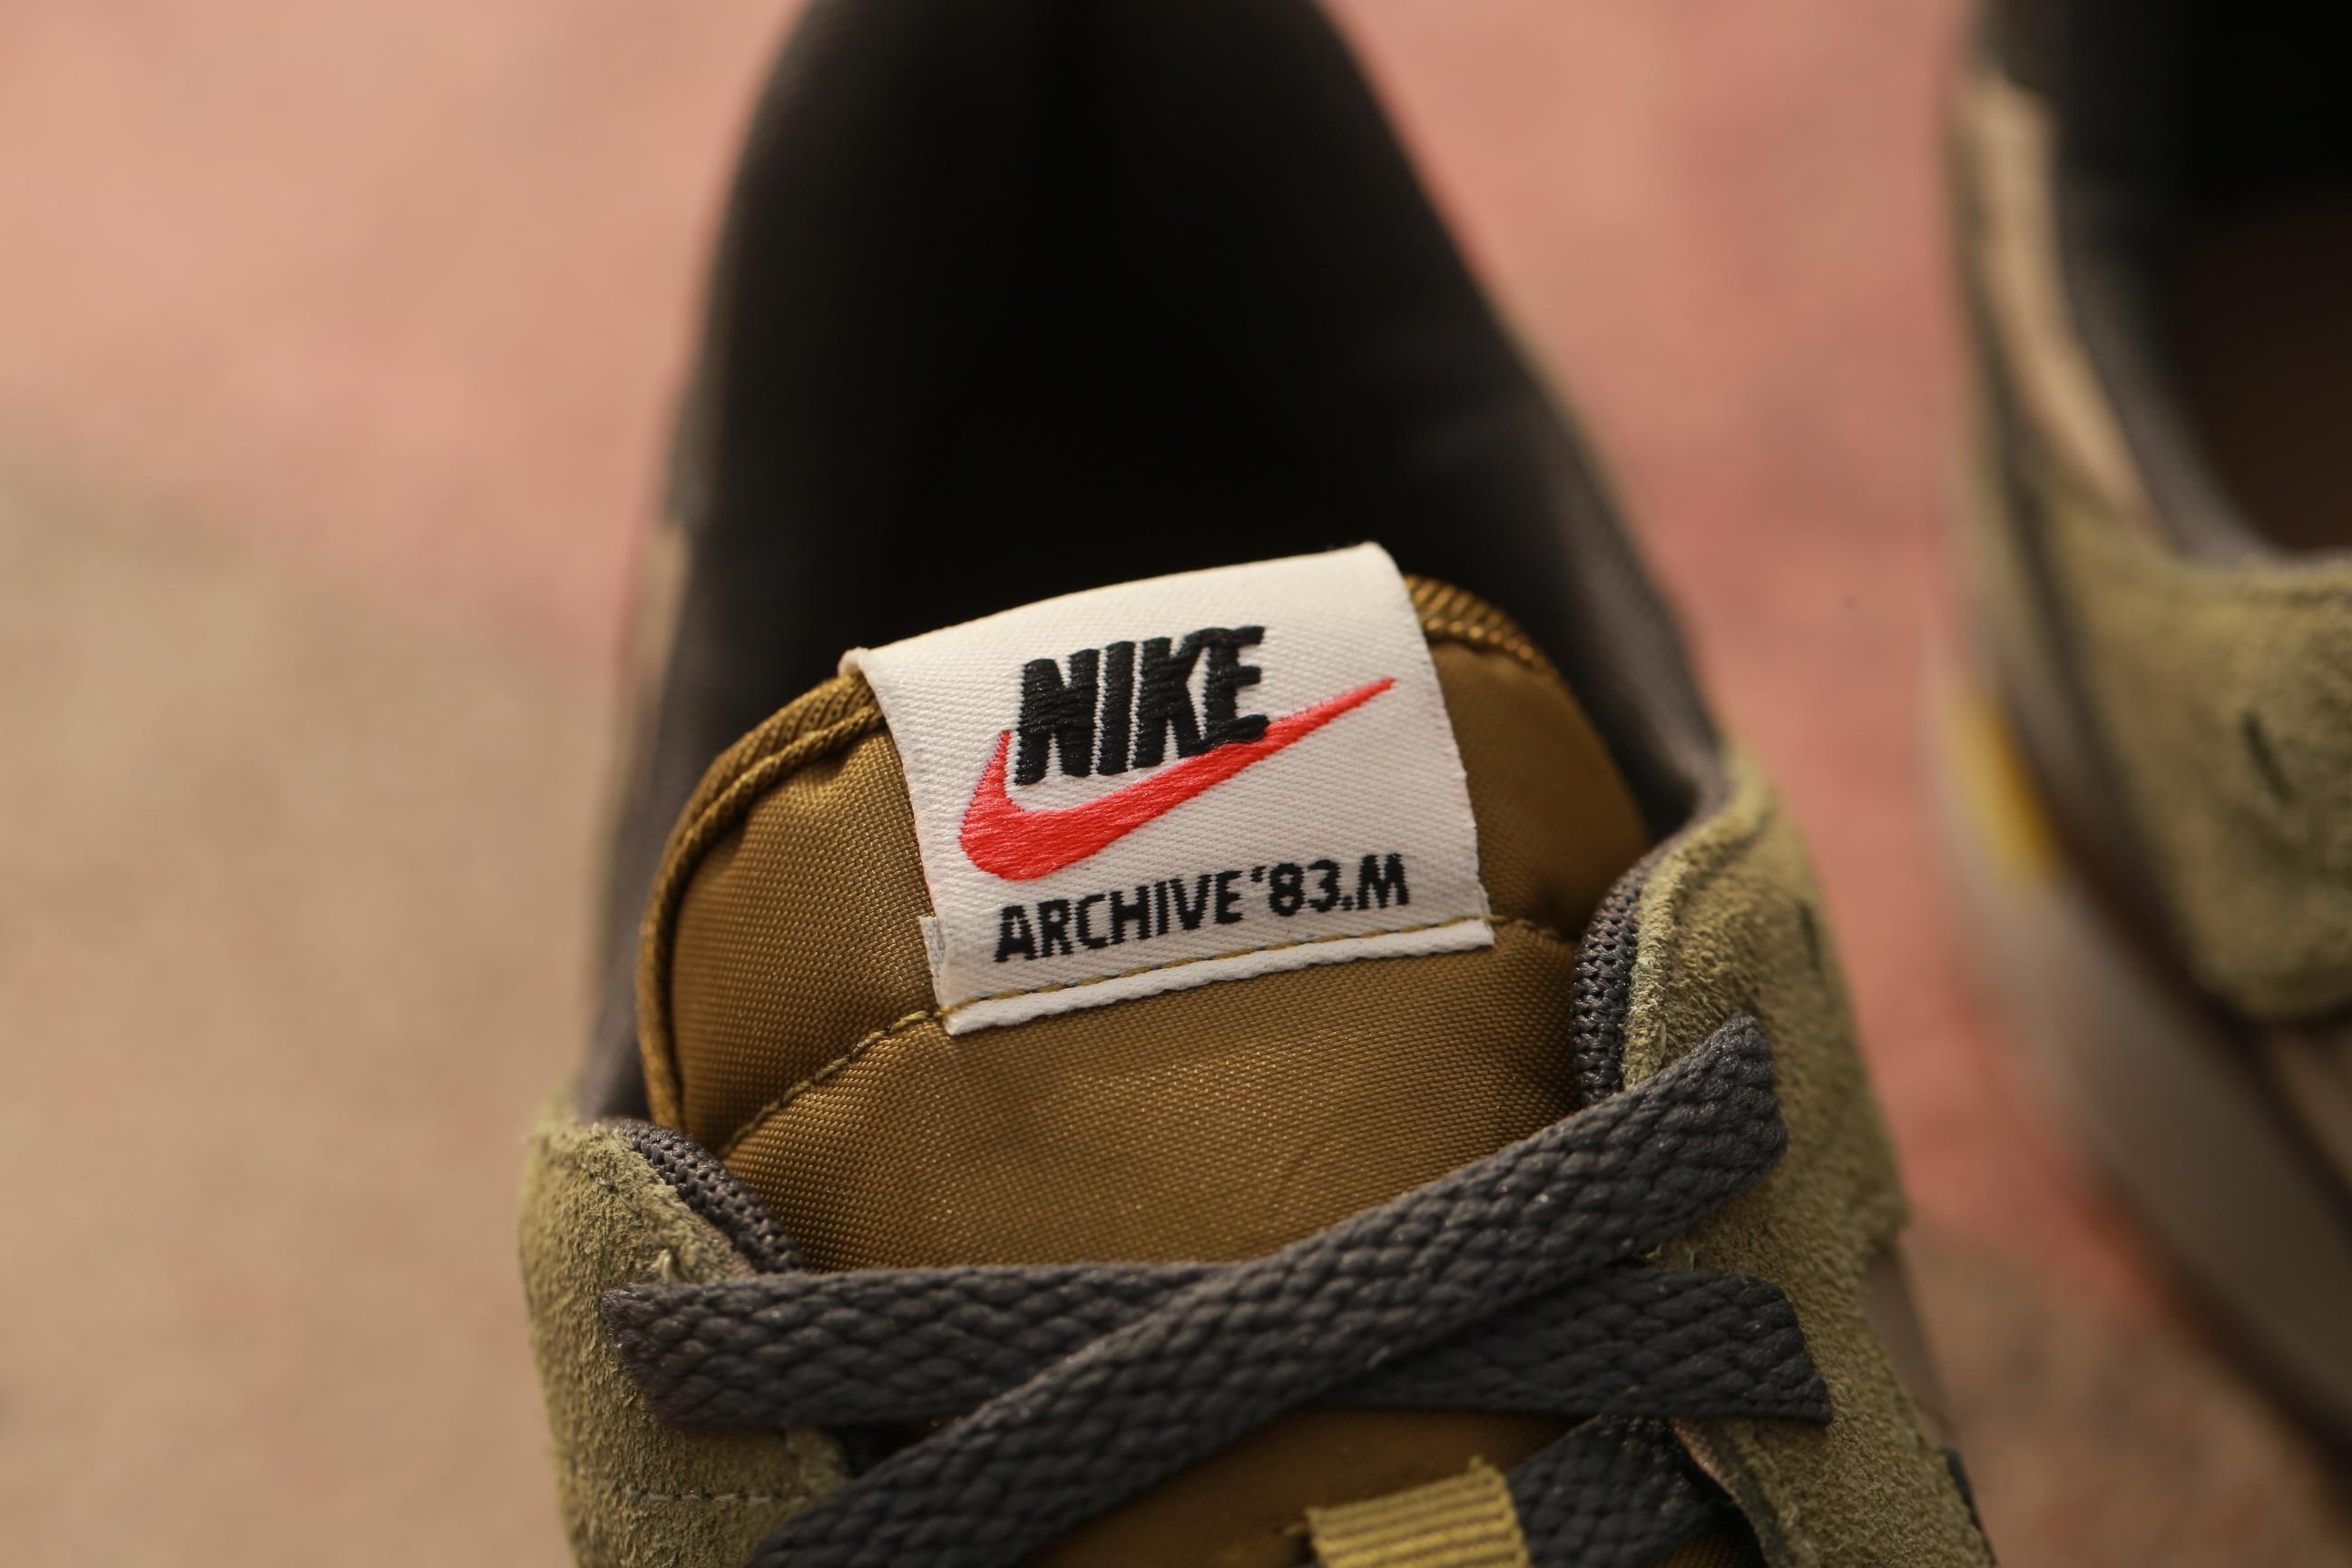 cd63bcf2f51e Nike Archive 83.M – Medium Olive   Desert Camo   Militia Green ...